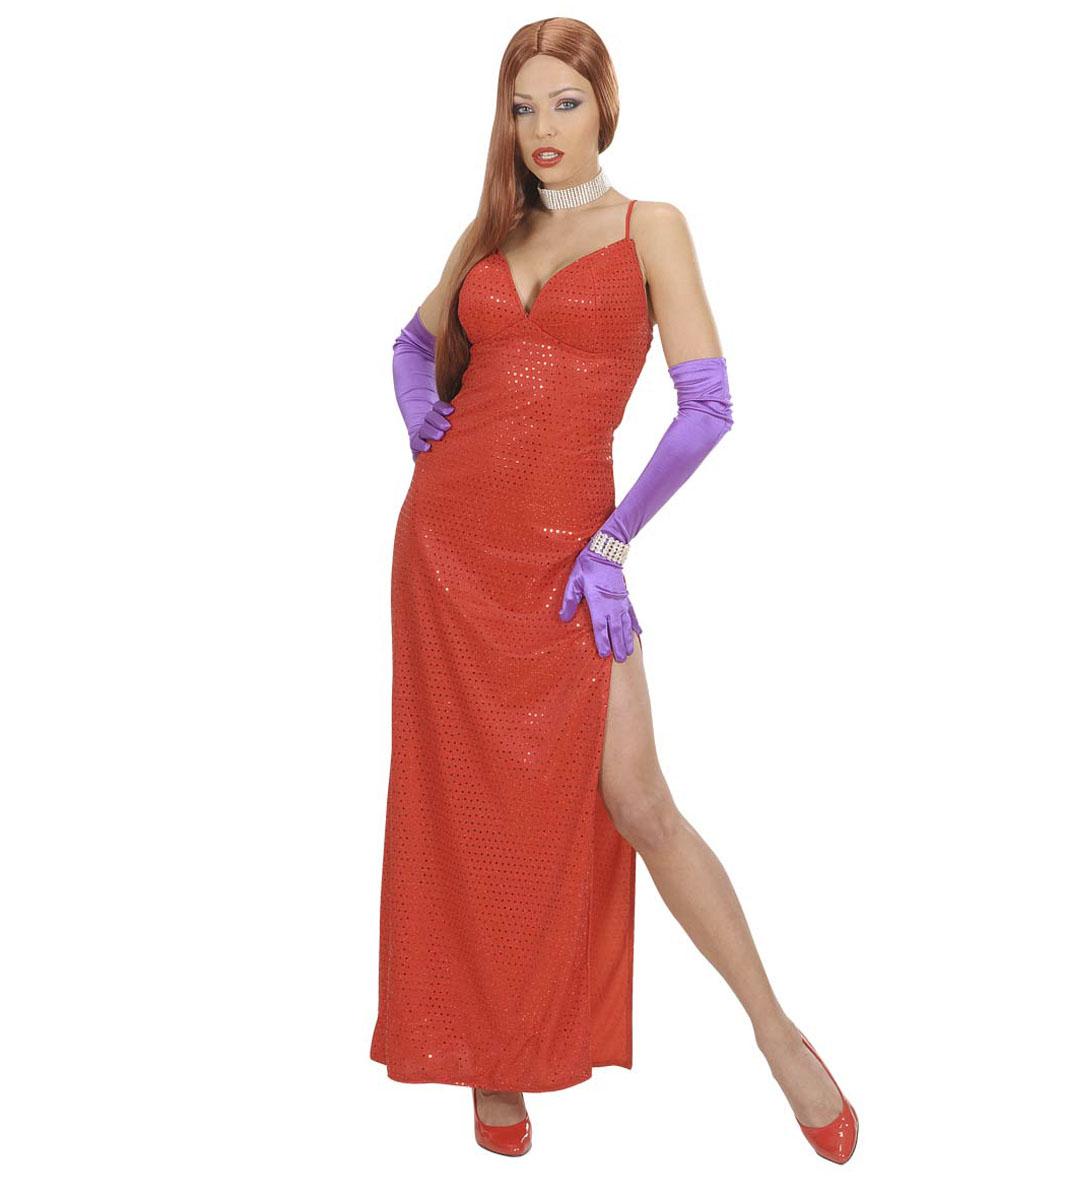 Costume Femme Fatale